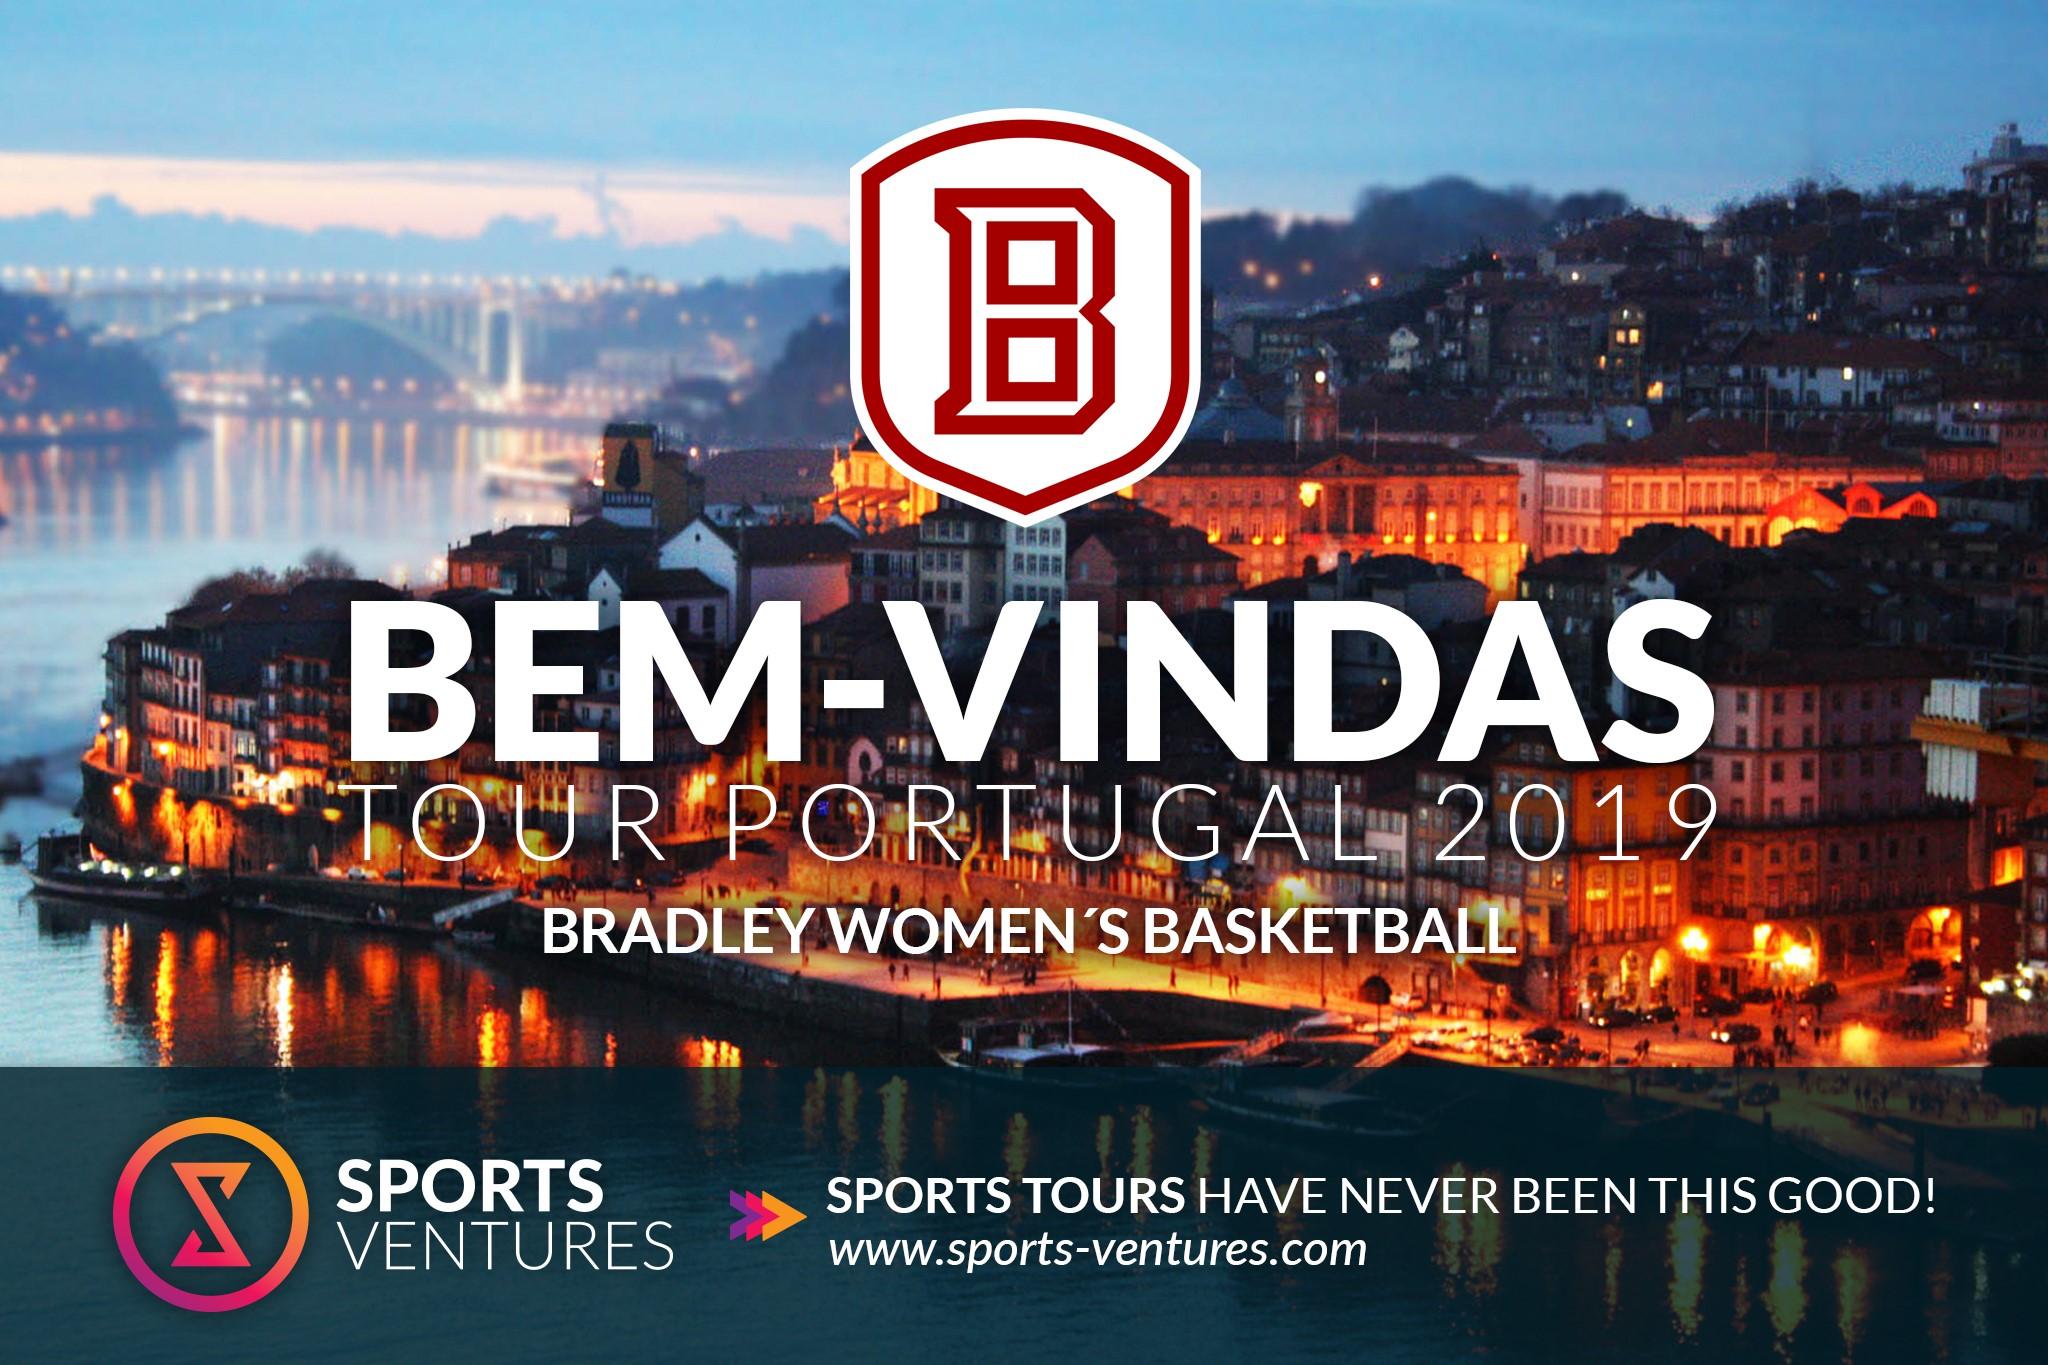 Bradley basketball Tour Portugal 2019